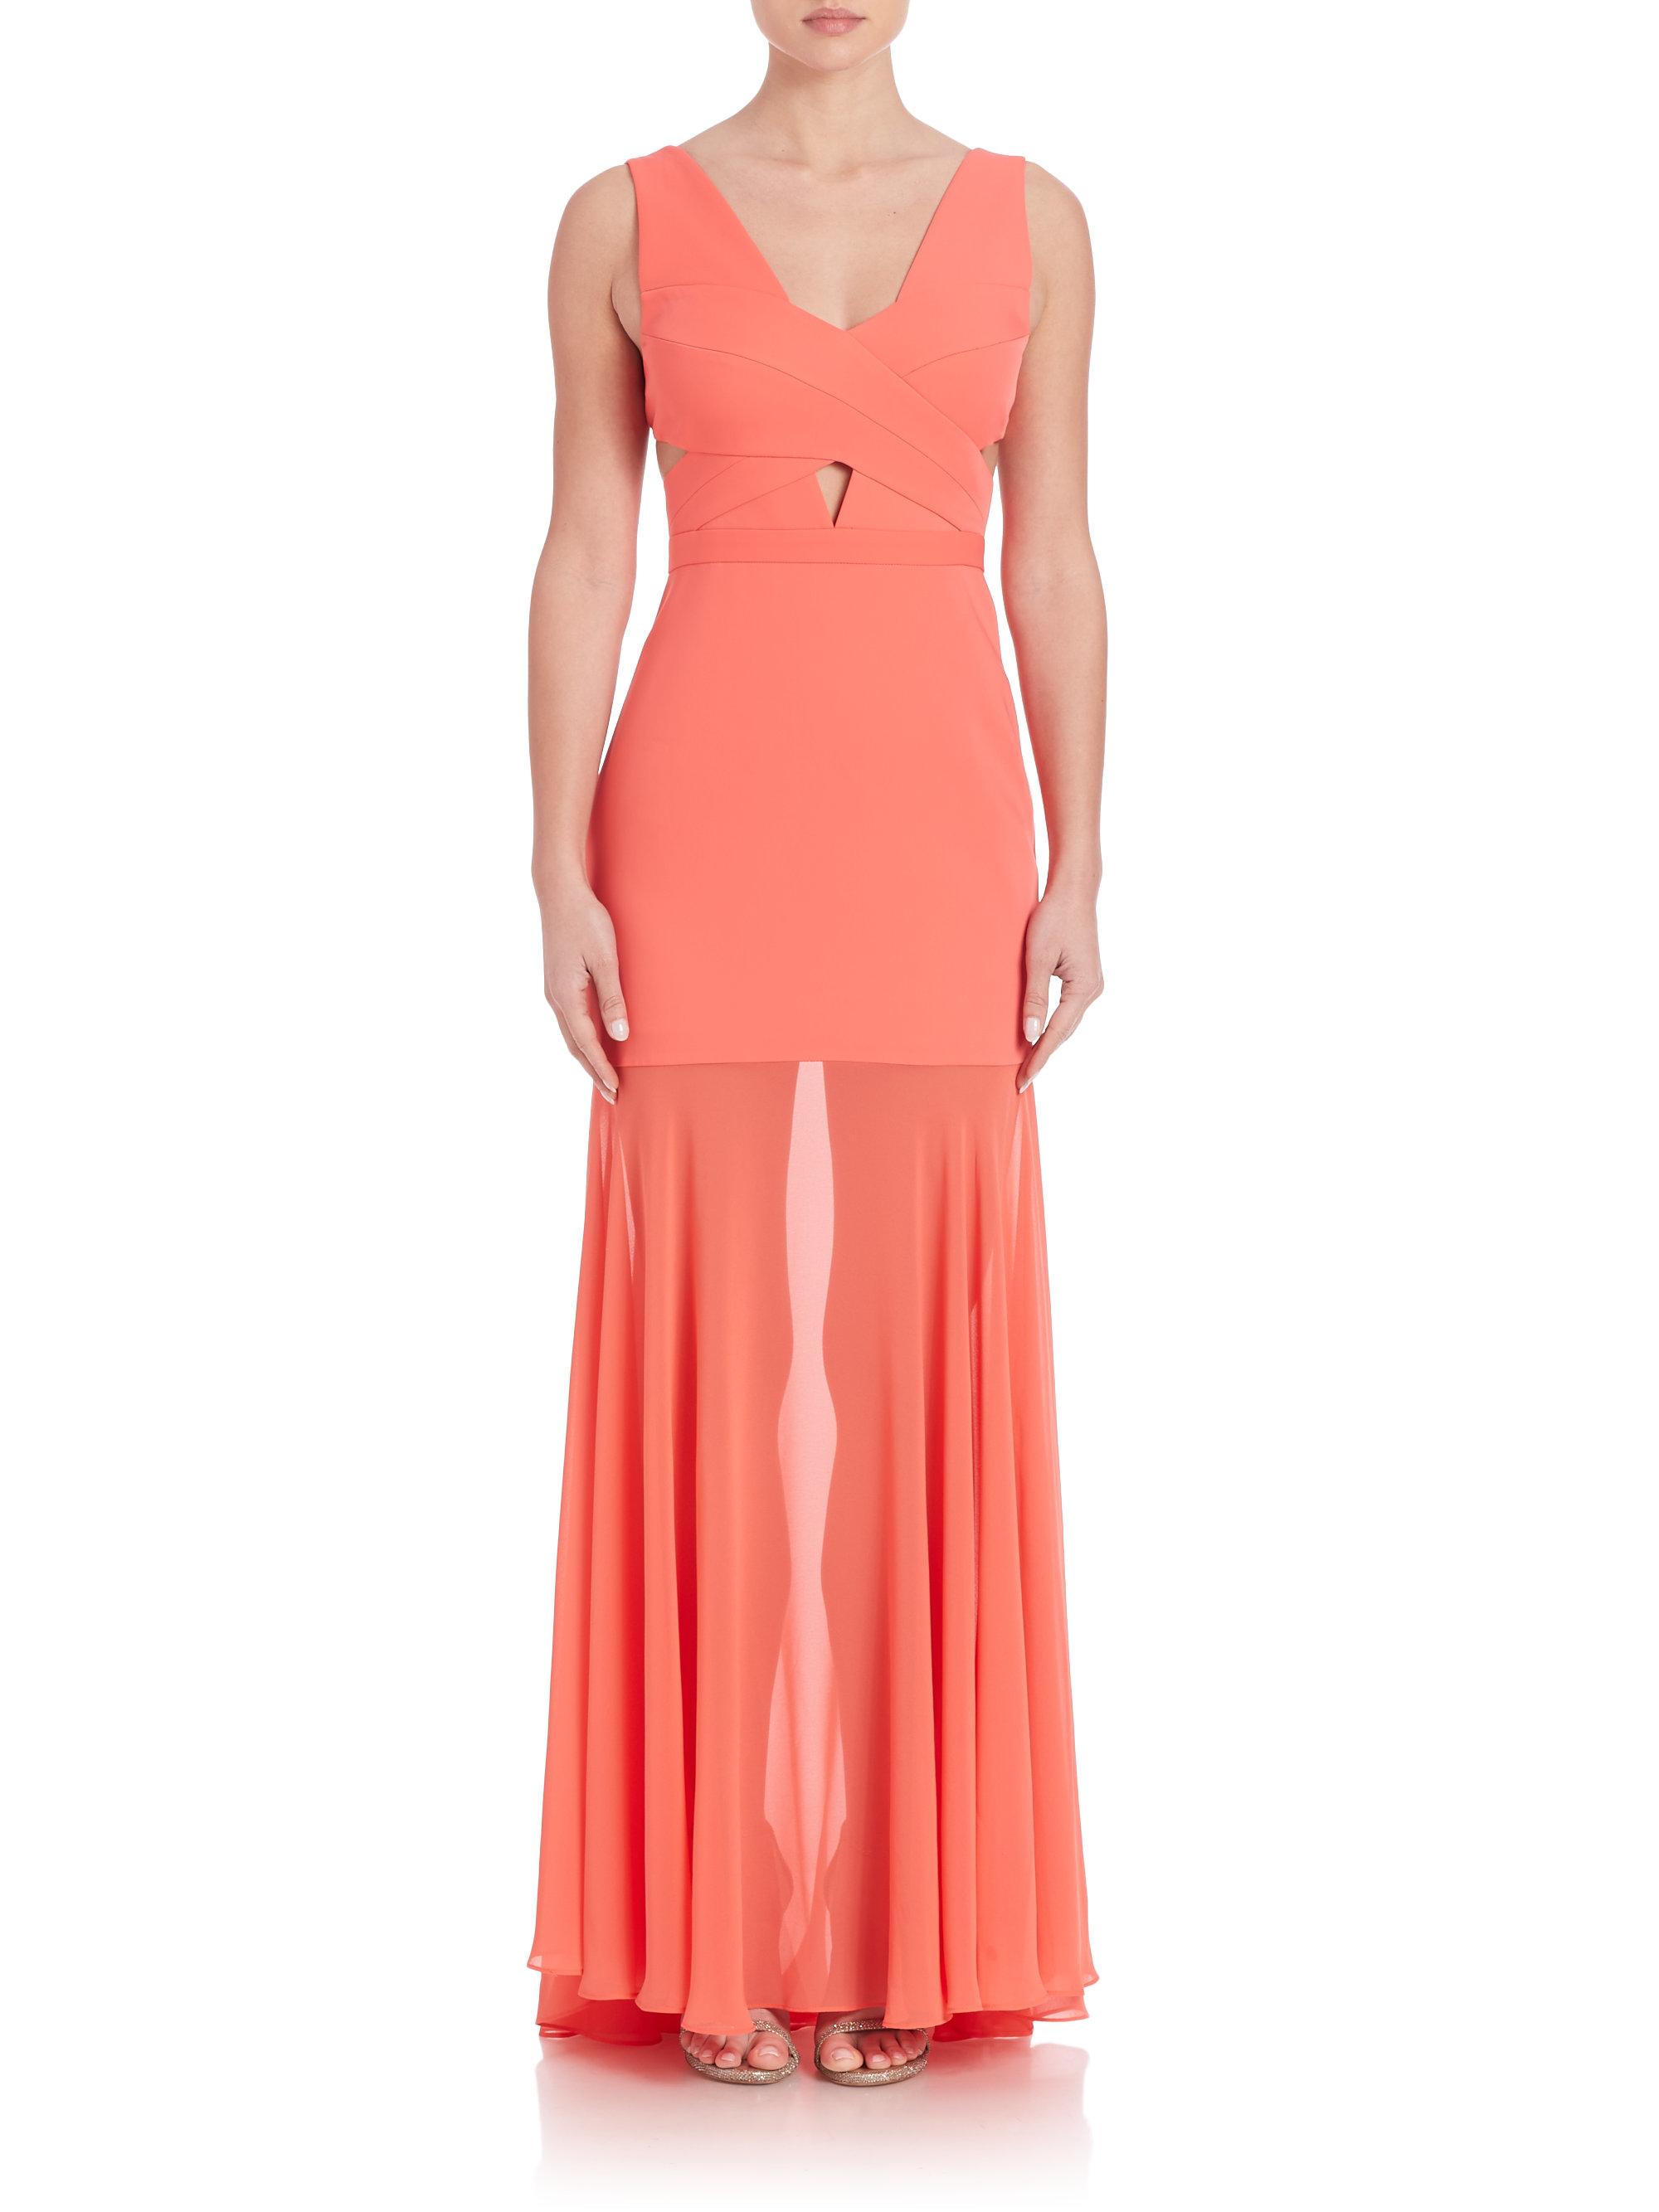 BCBG Cut Out Dress_Other dresses_dressesss